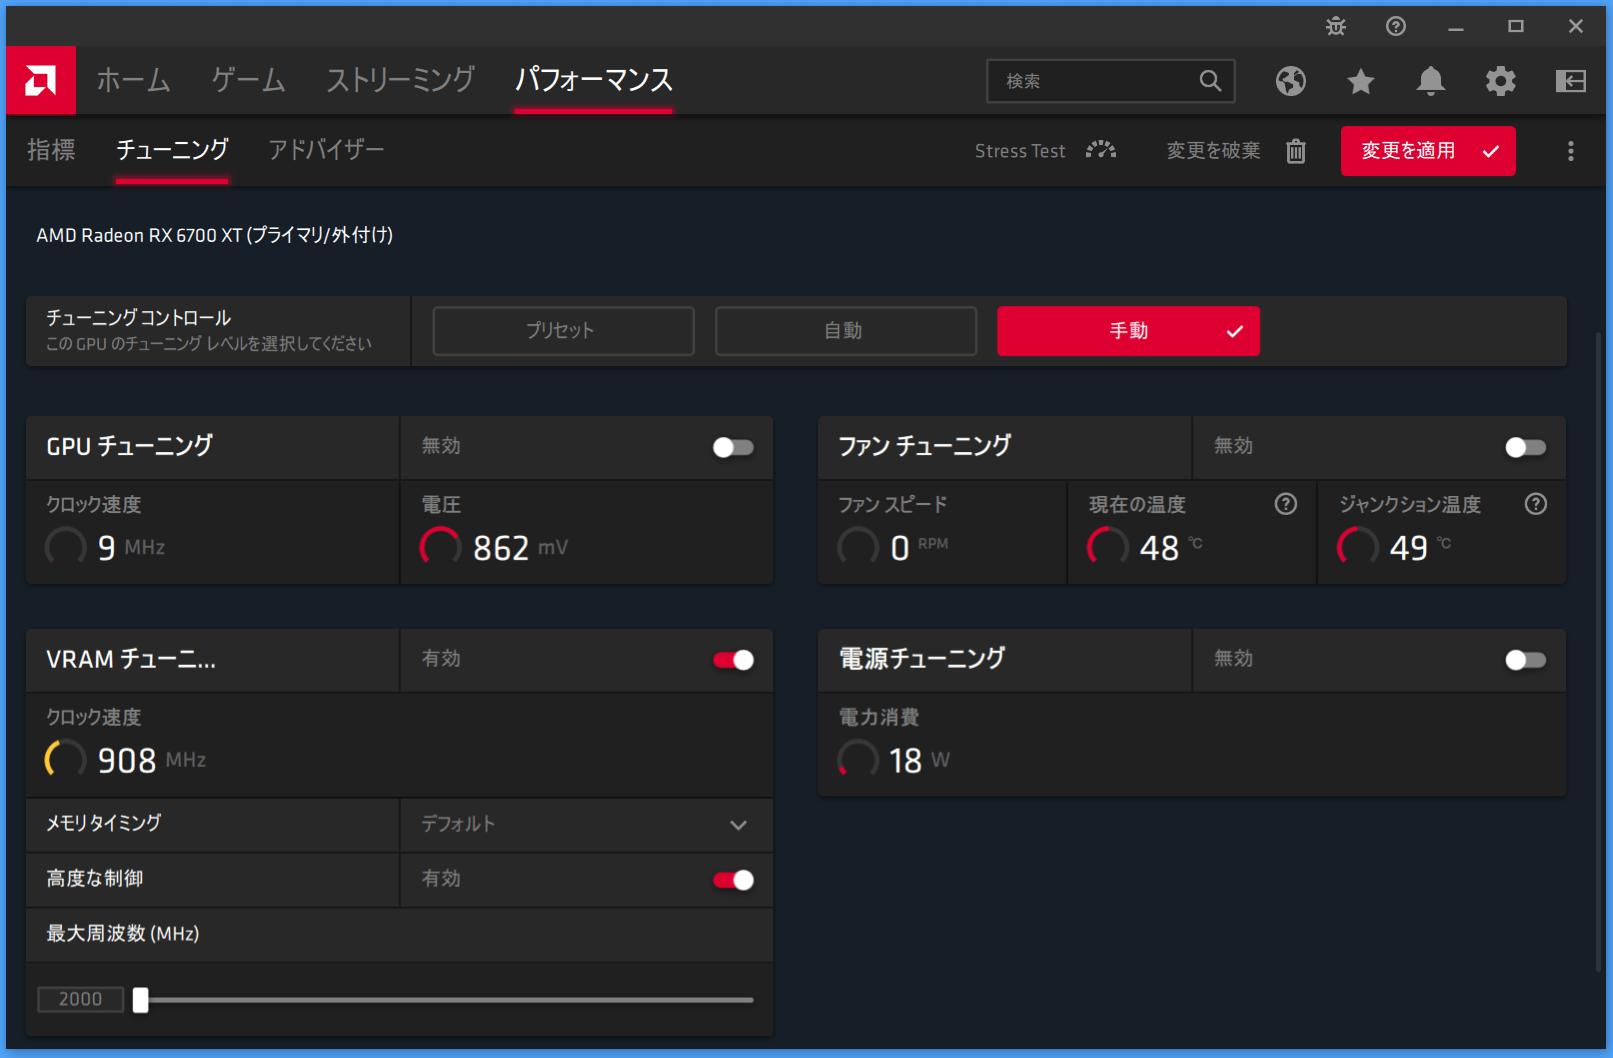 Radeon RX 6700 XT_Radeon-Setting_5_VRAM-Clock